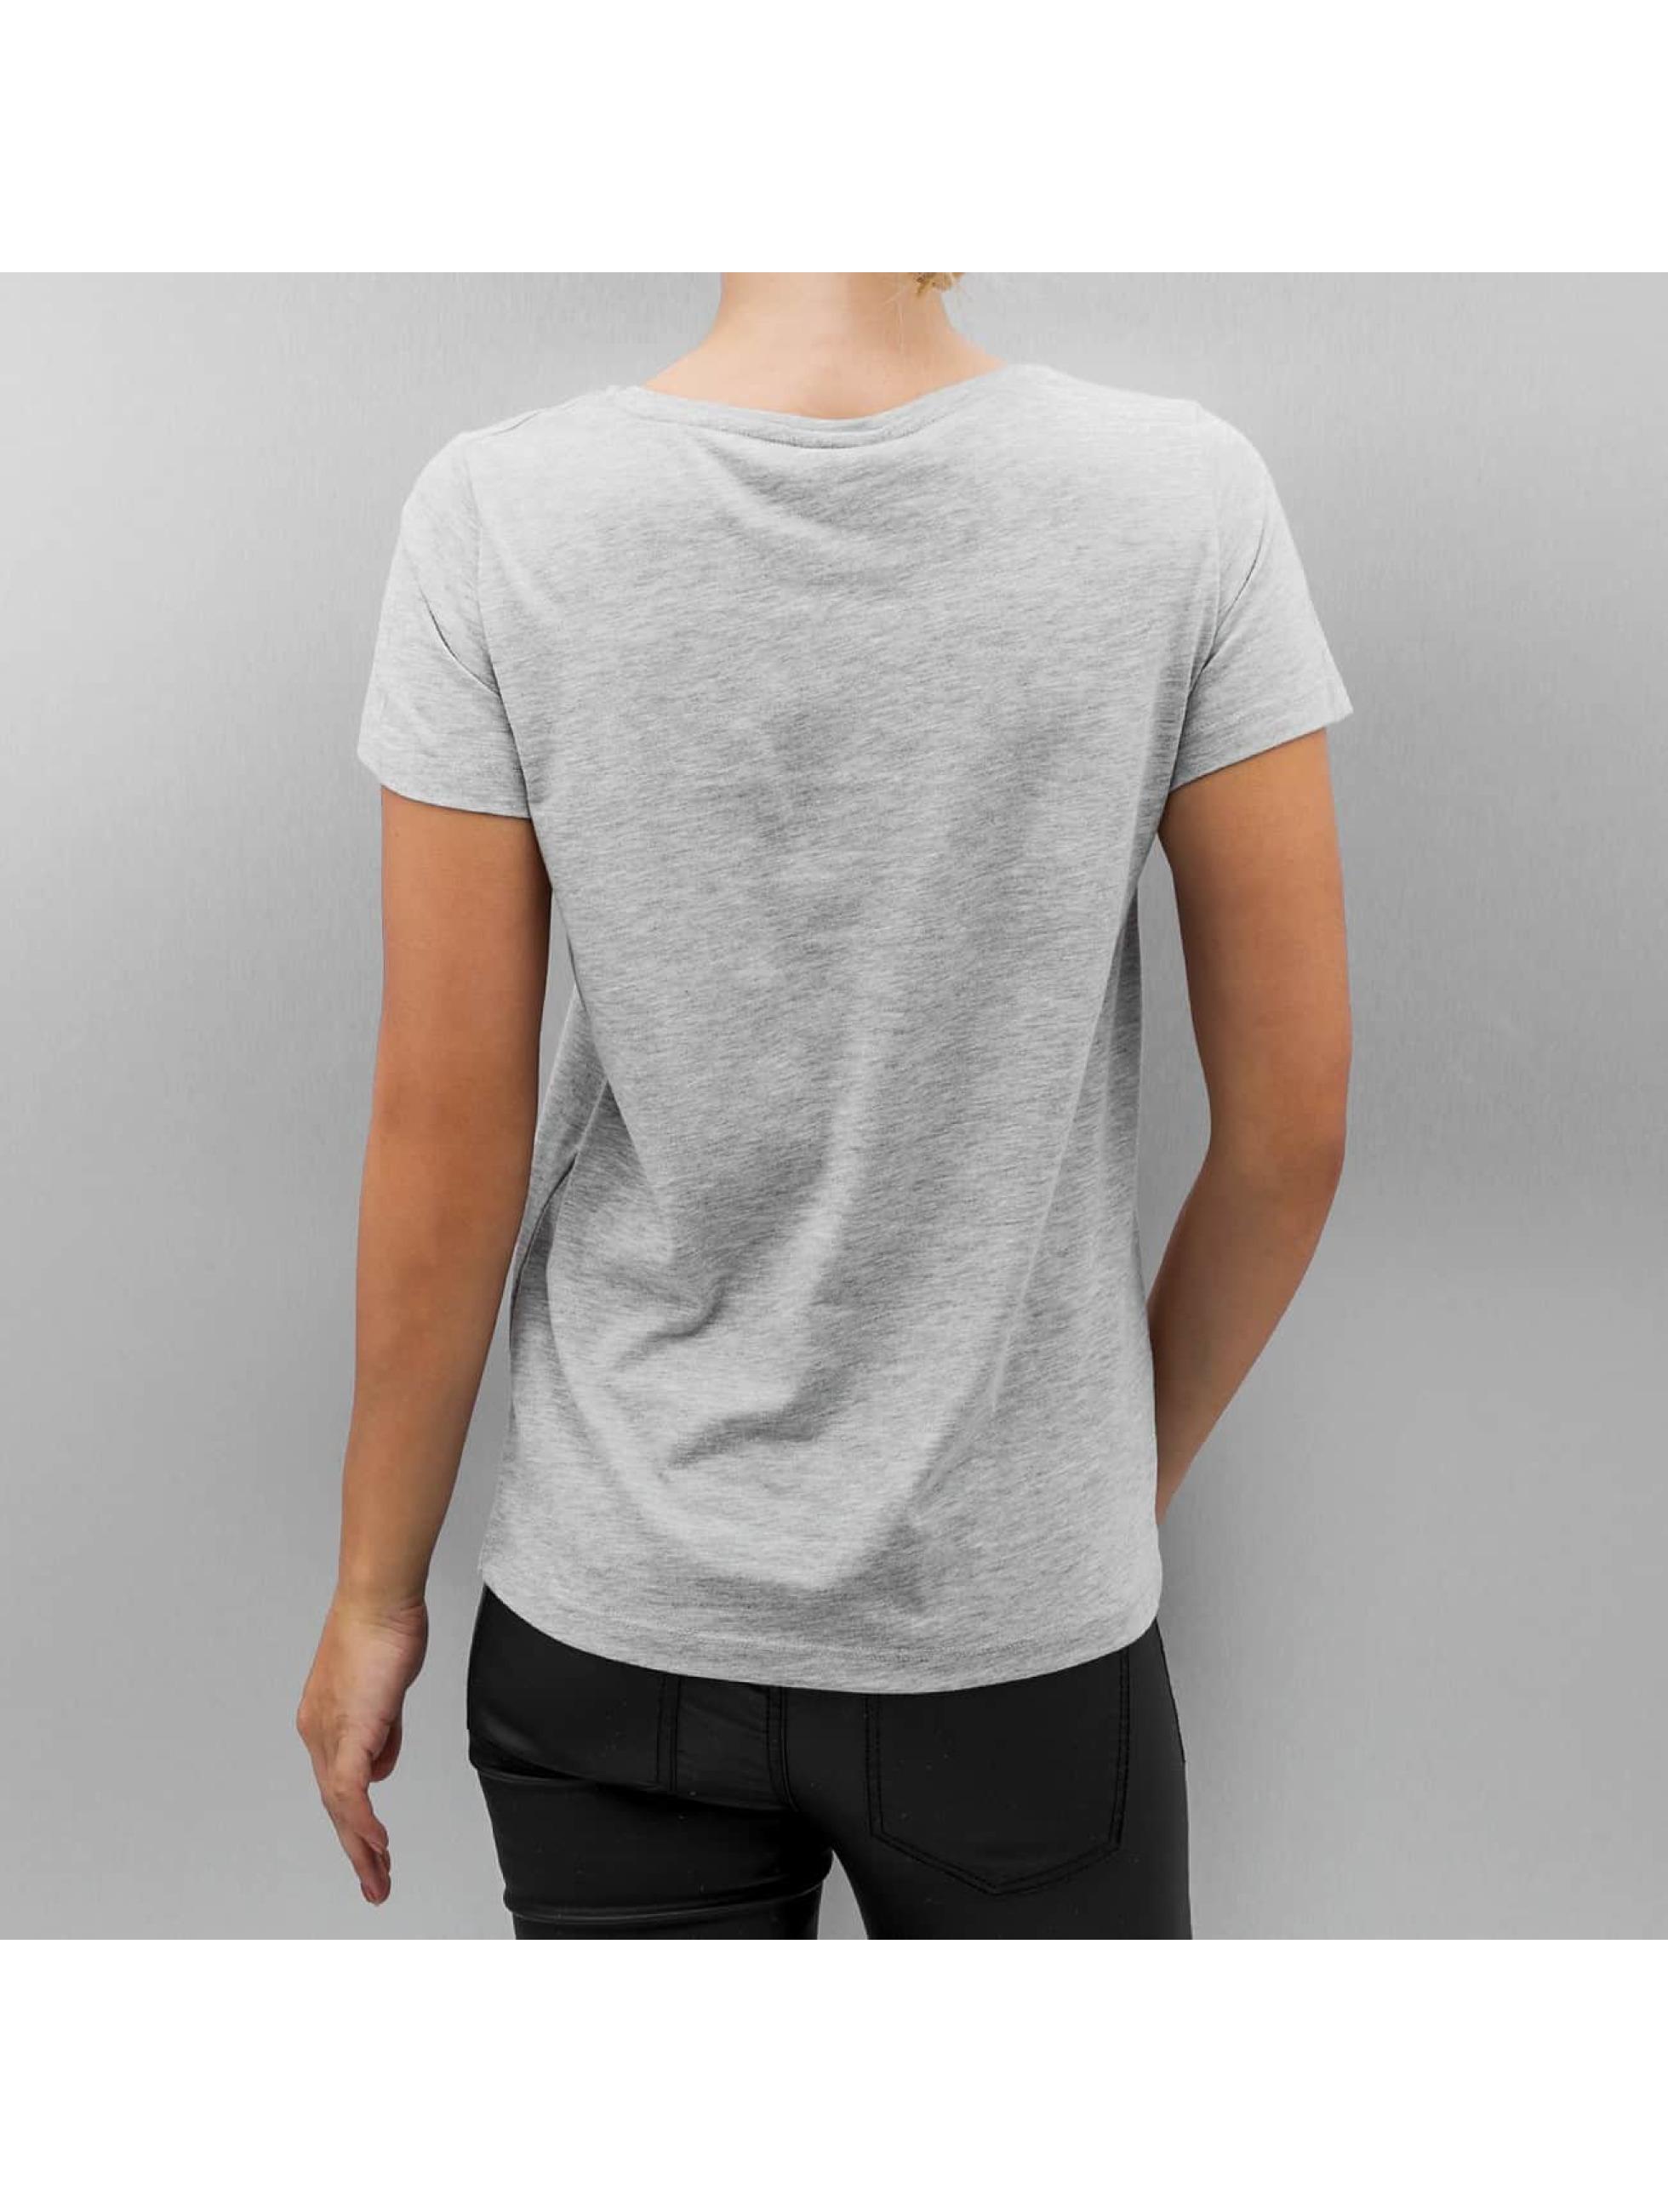 Vero Moda T-Shirt VmMy grau